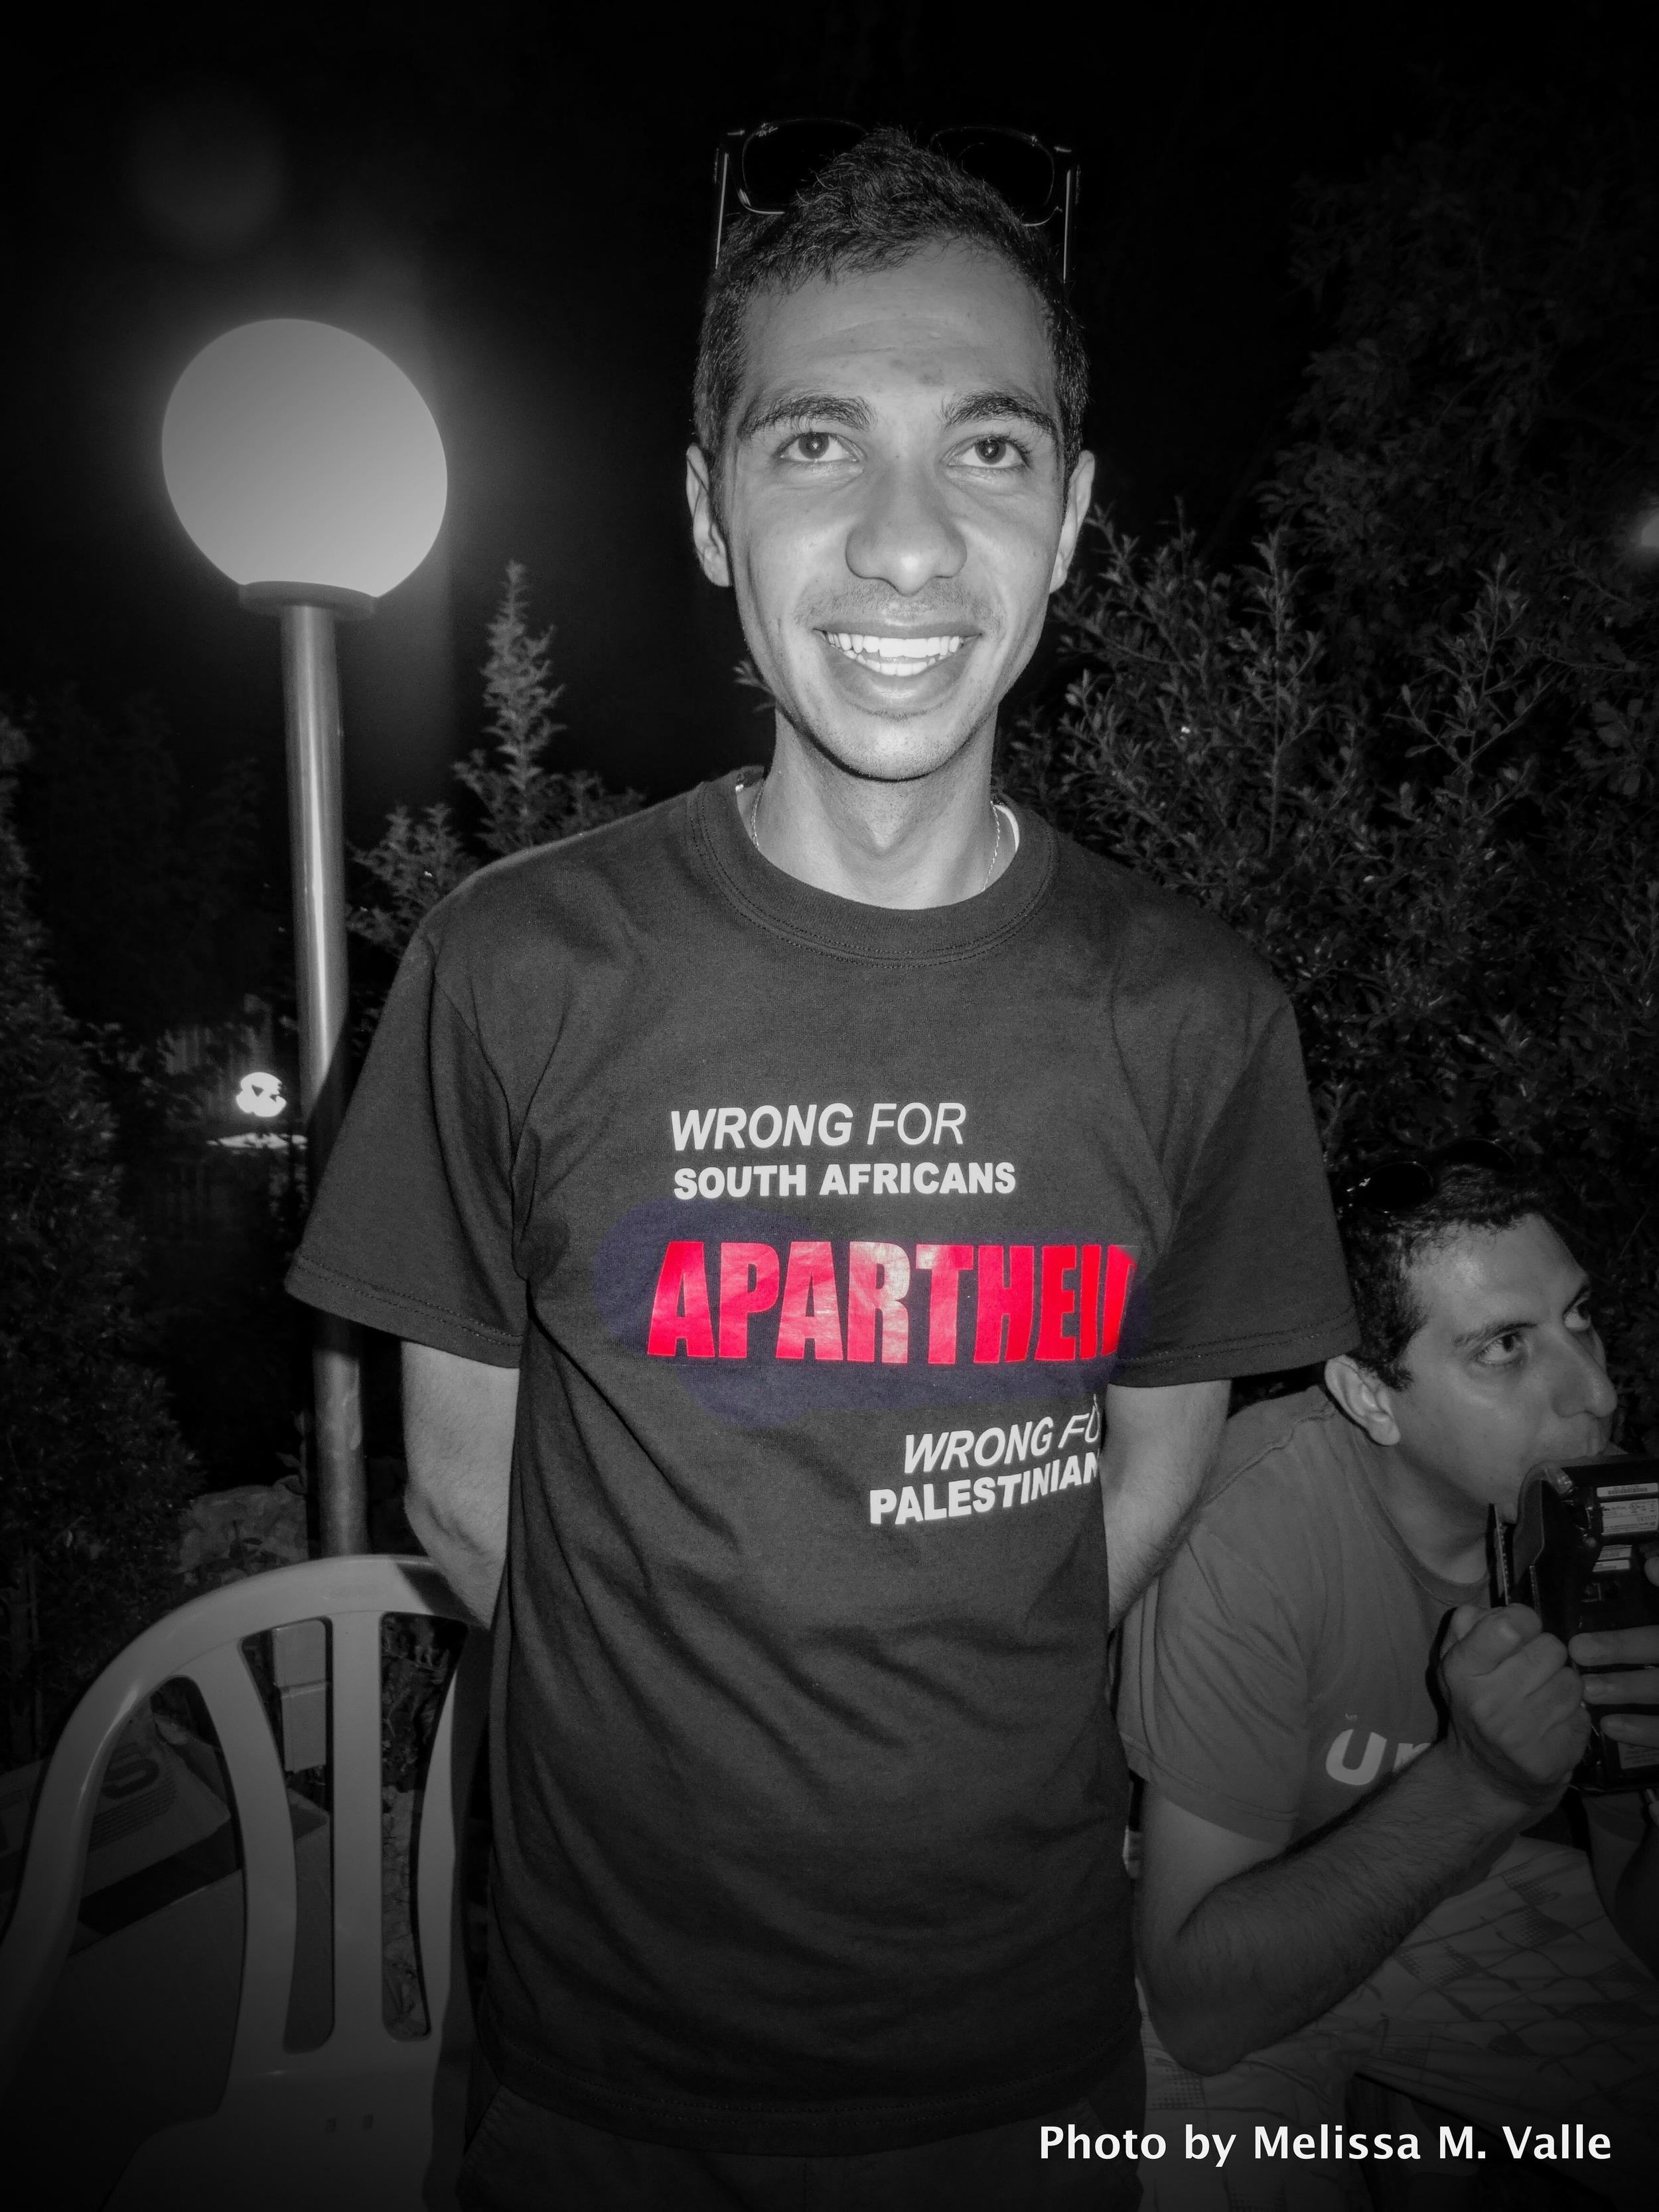 Apartheid Palestine South Africa tee